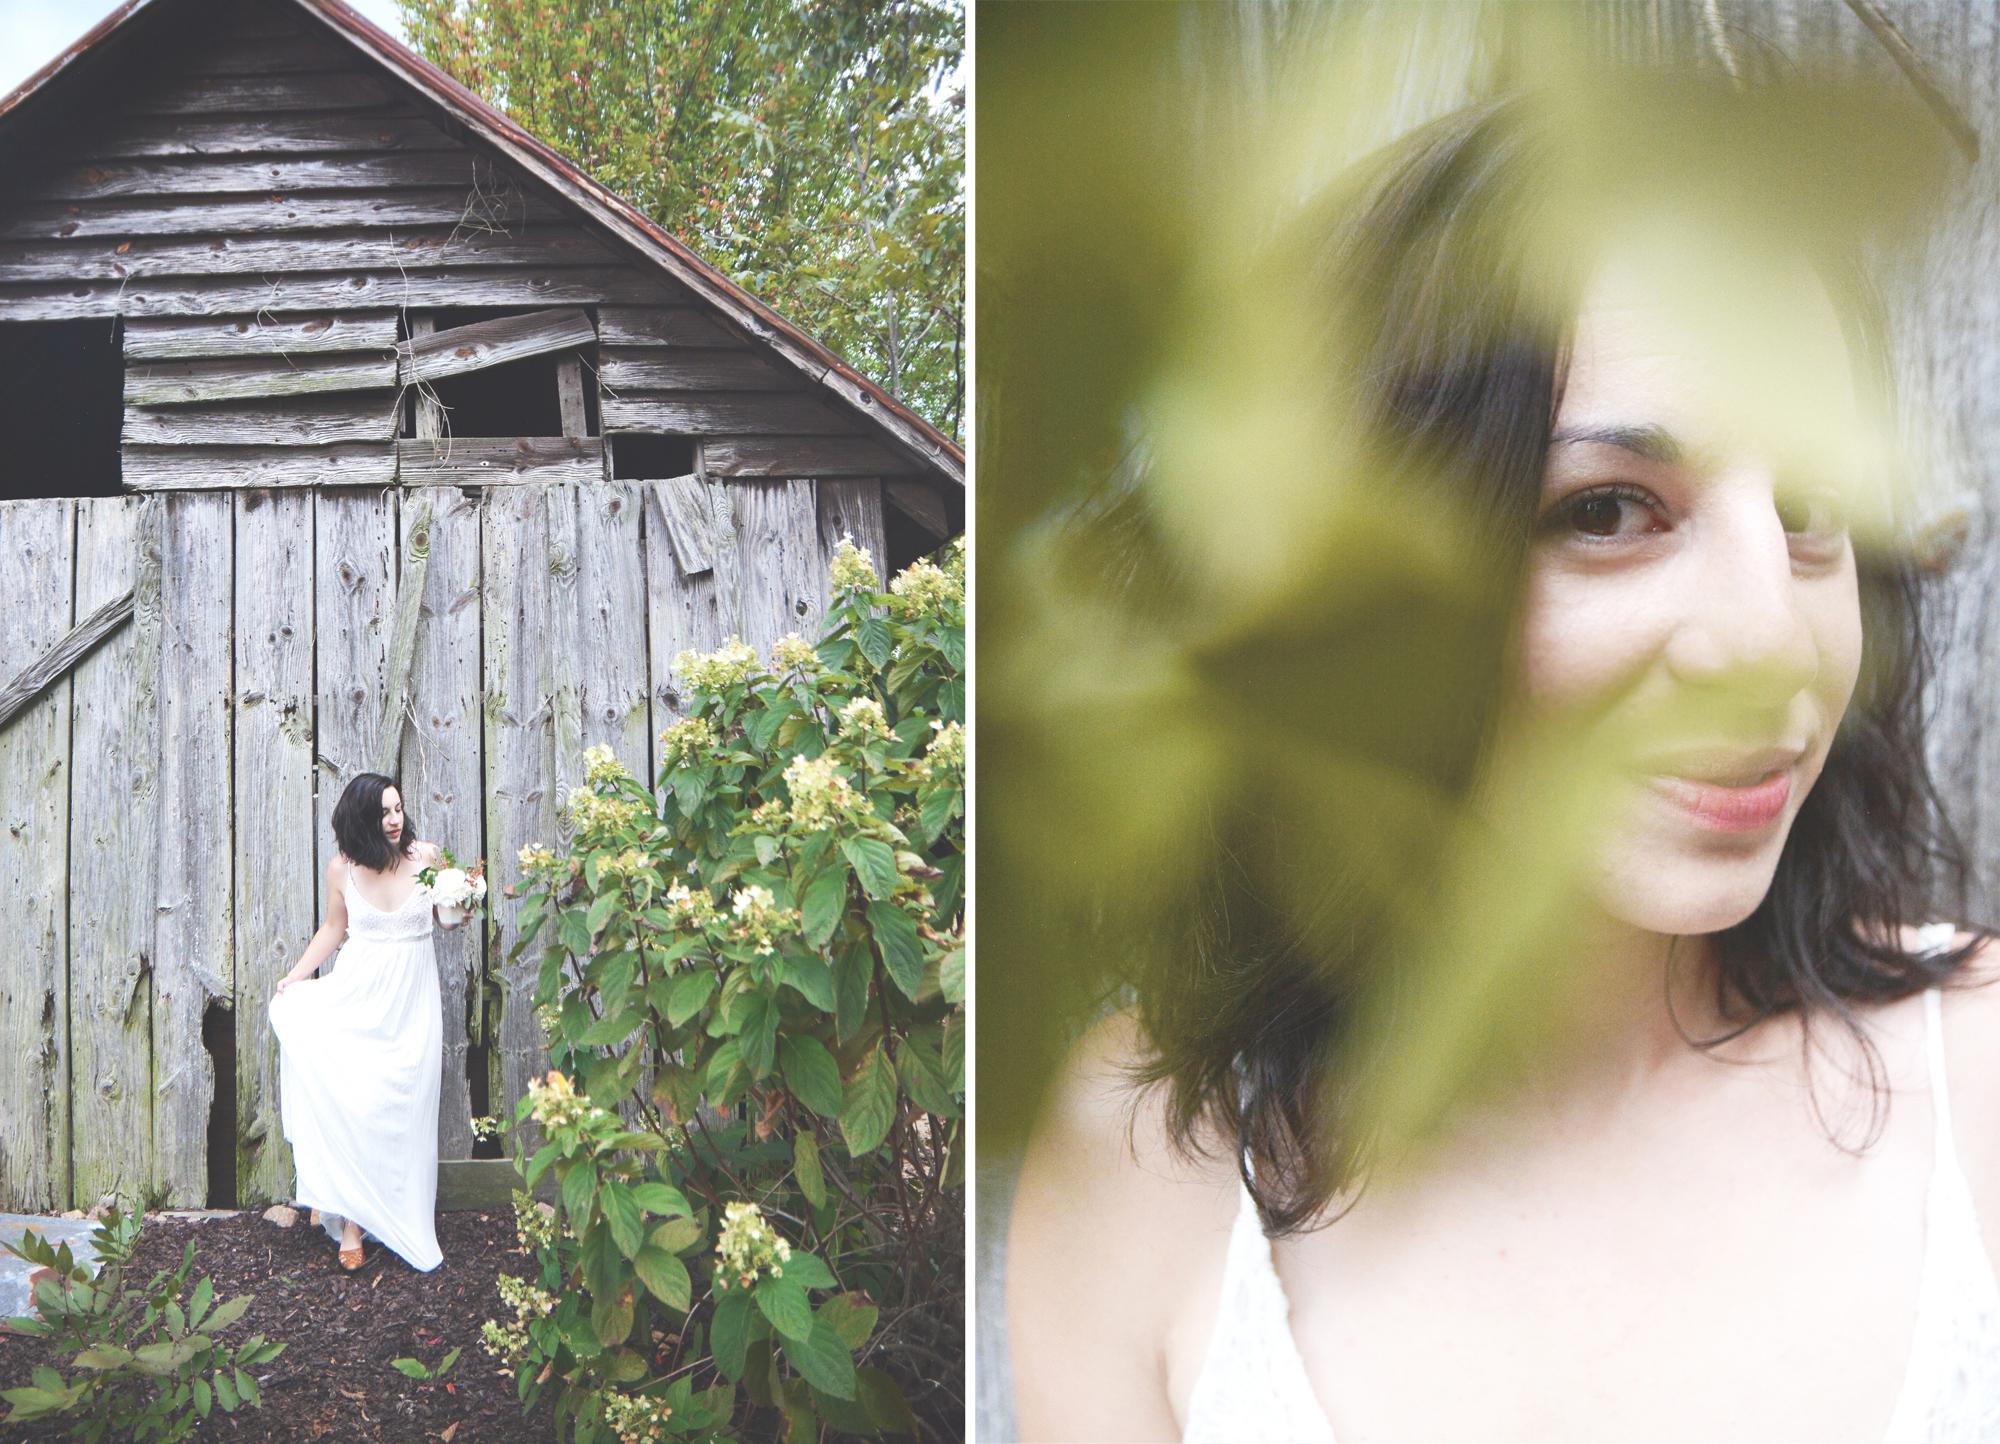 sunny-d-farms-wedding-photography-six-hearts-photography-4-1